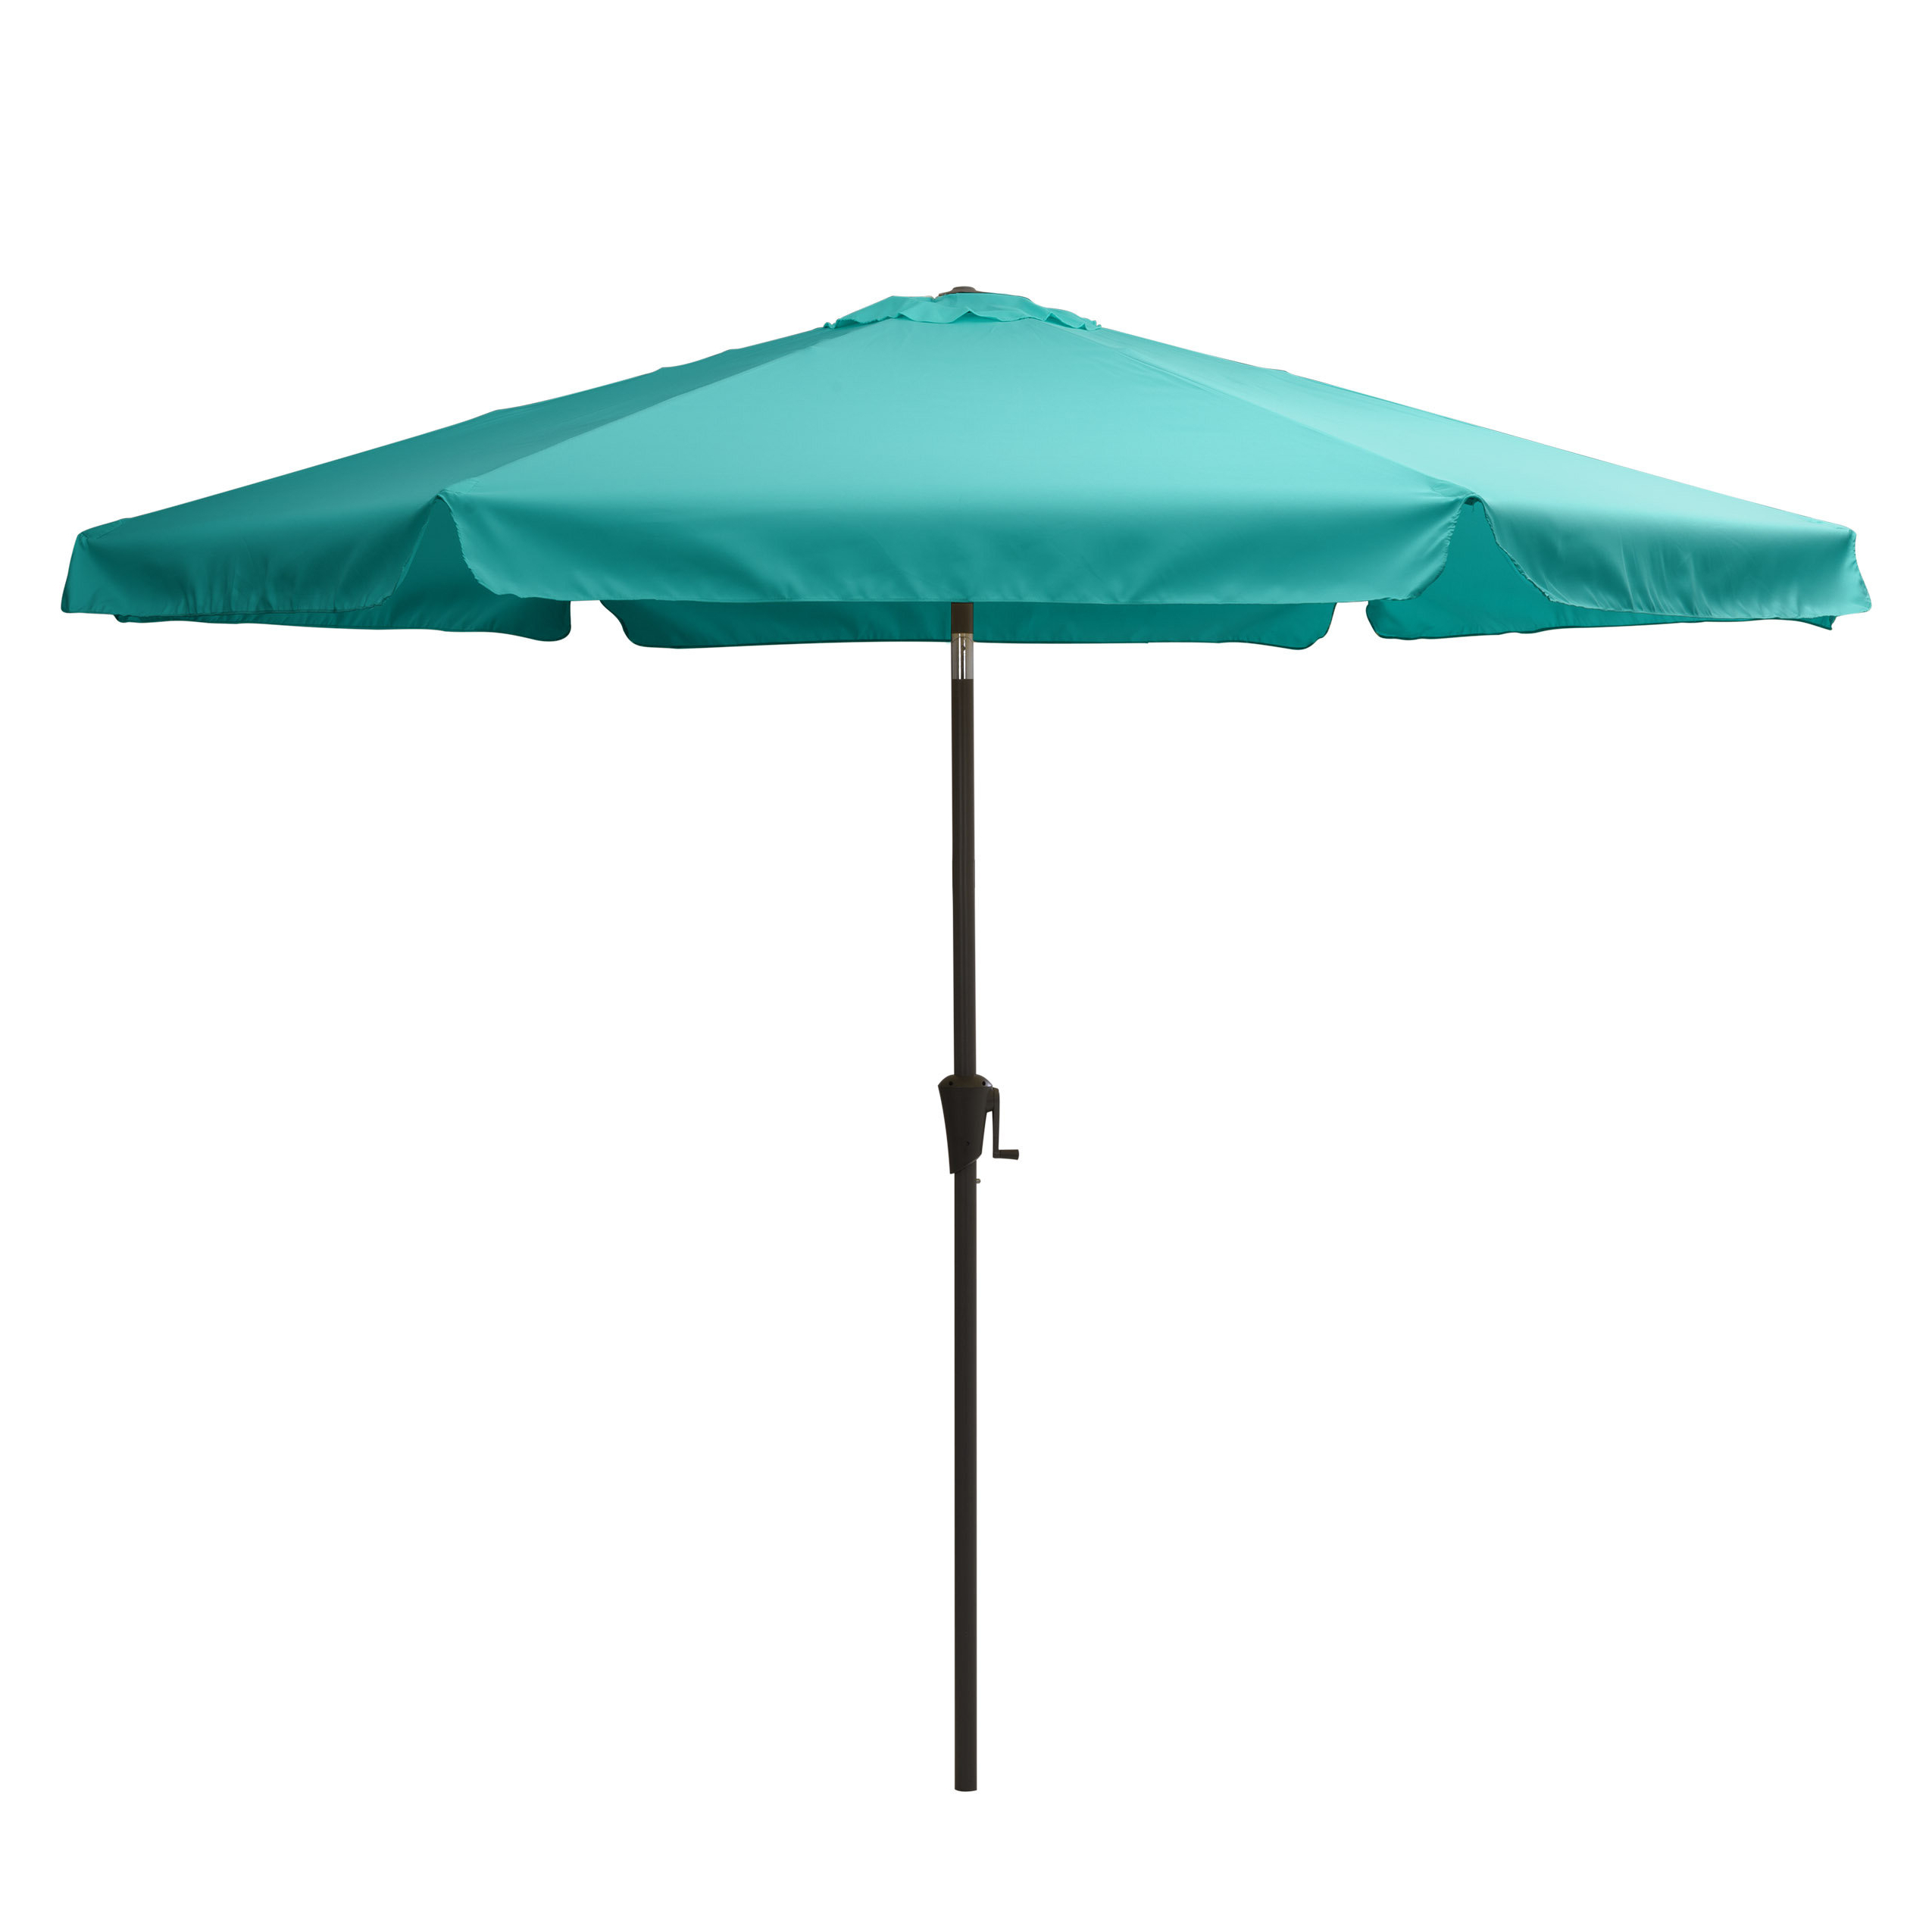 Pedrick Drape Market Umbrellas Pertaining To Most Up To Date Crowborough 10' Market Umbrella (View 14 of 20)